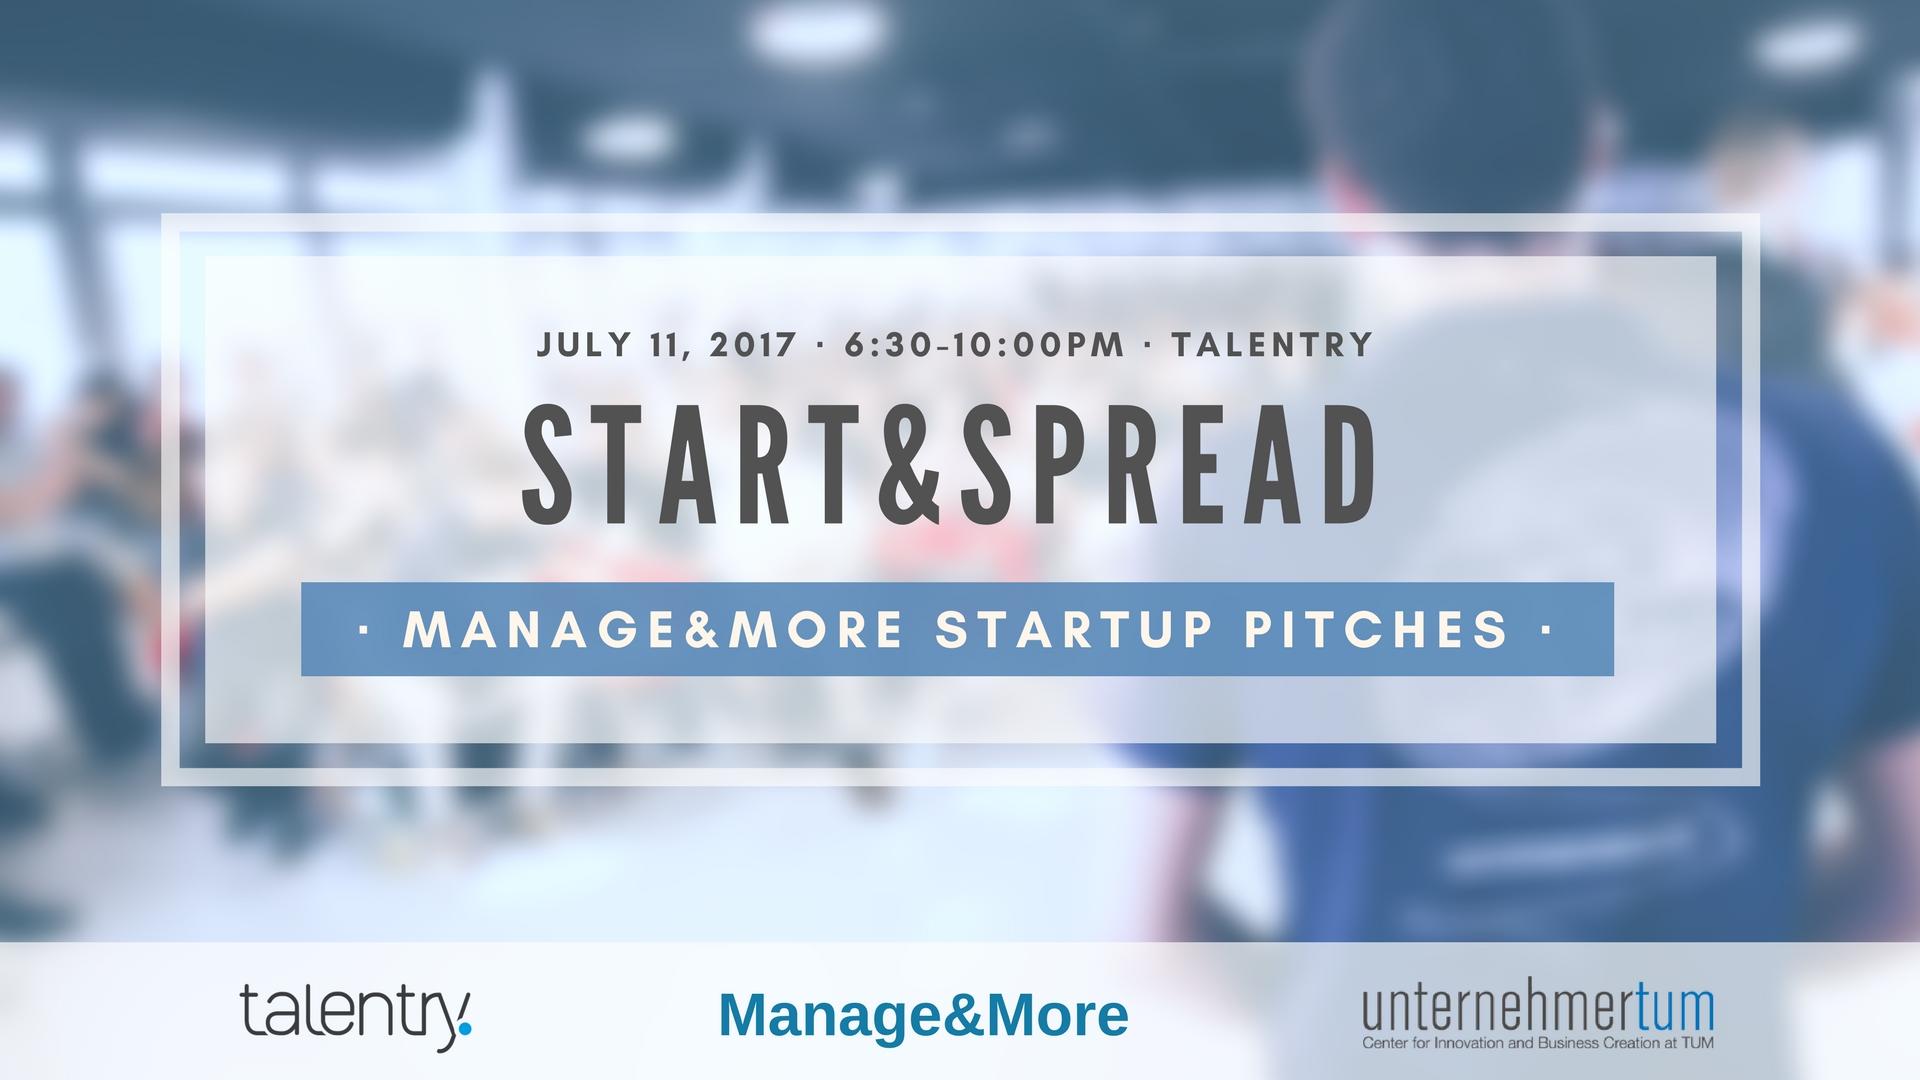 Start & Spread